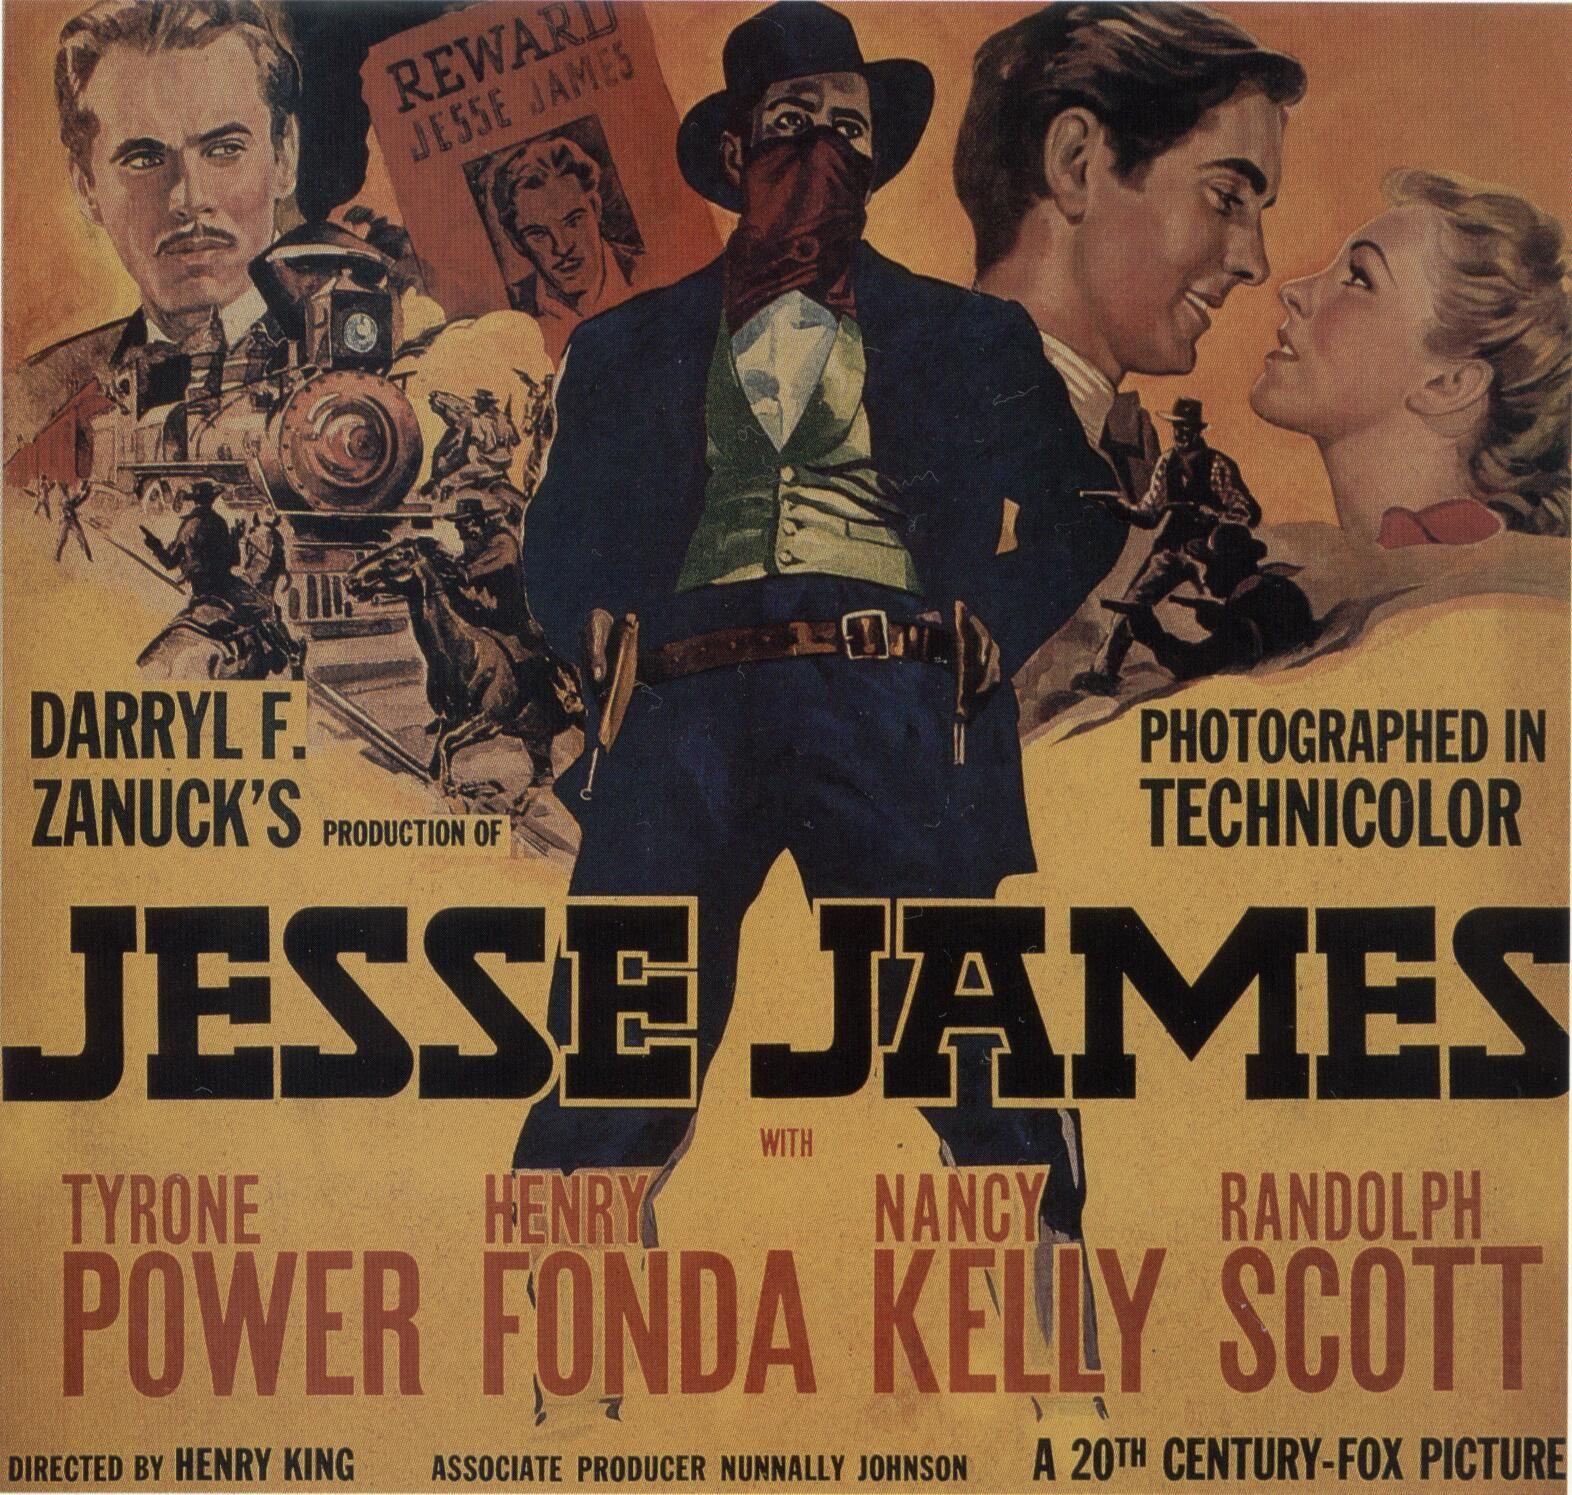 Jesse jane каталог фильм